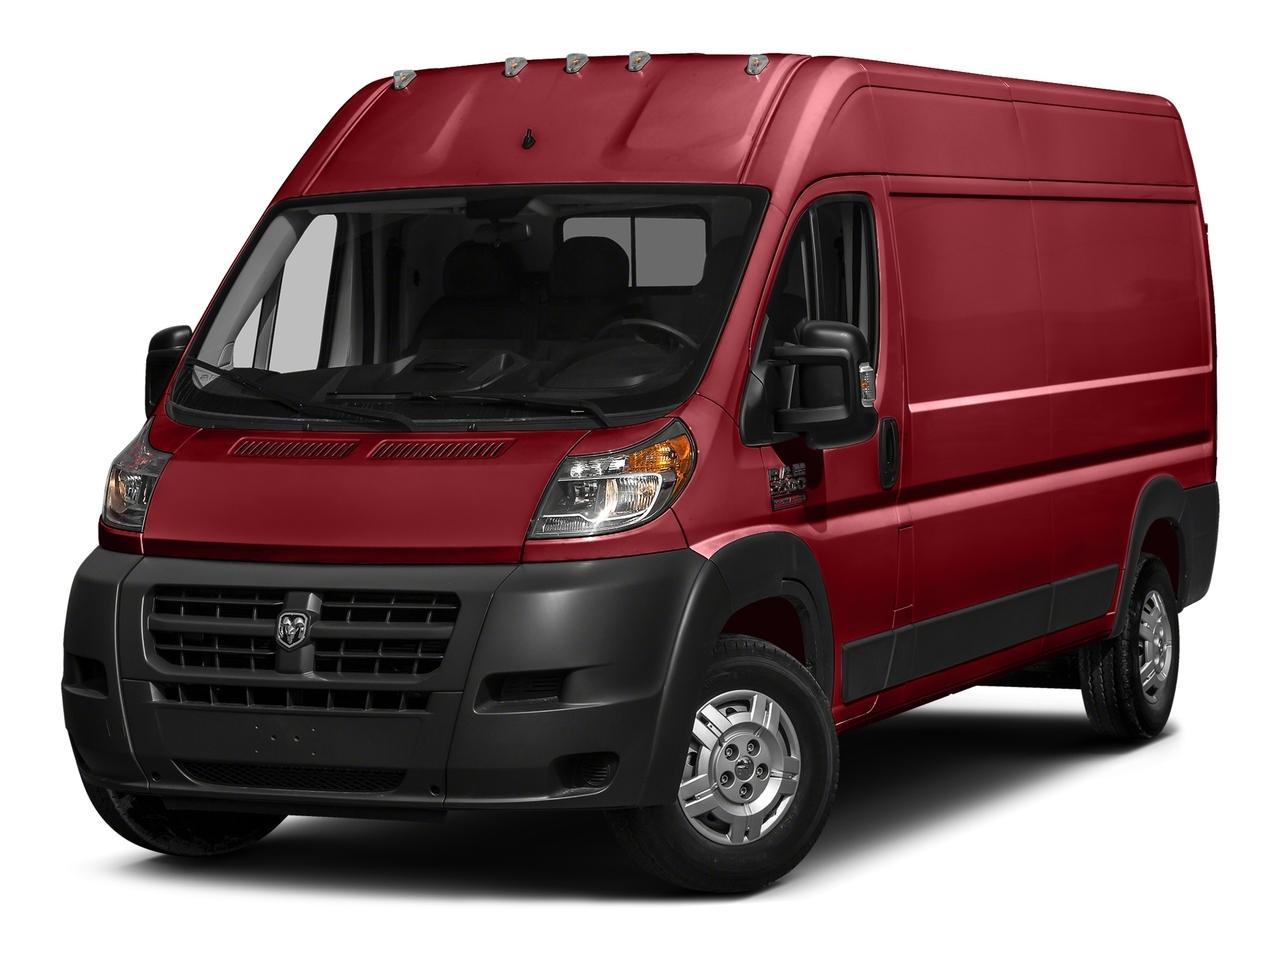 2017 Ram ProMaster Cargo Van Vehicle Photo in Washington, NJ 07882